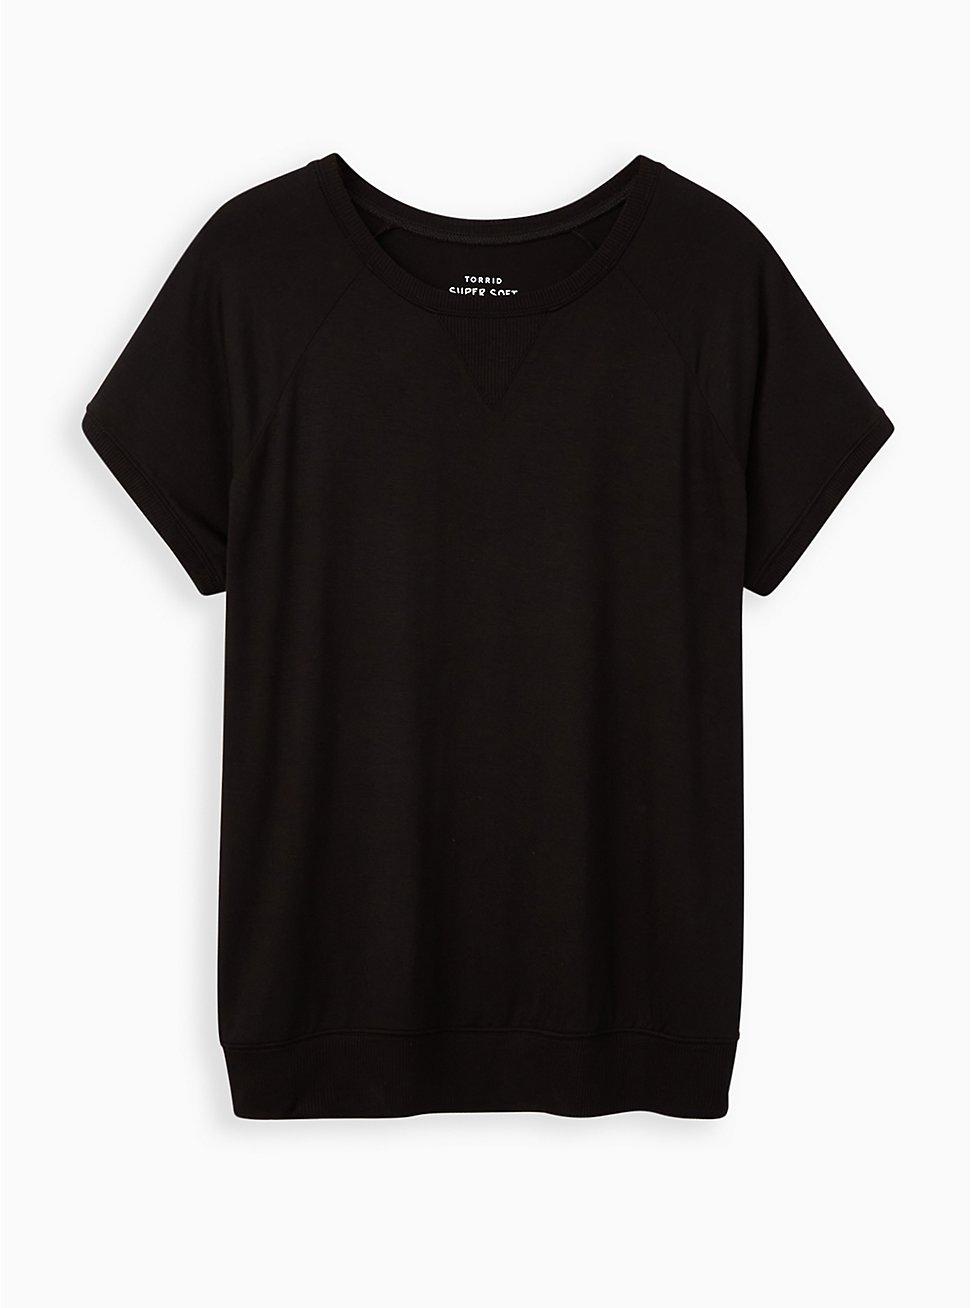 Plus Size Raglan Tee - Super Soft Black, DEEP BLACK, hi-res